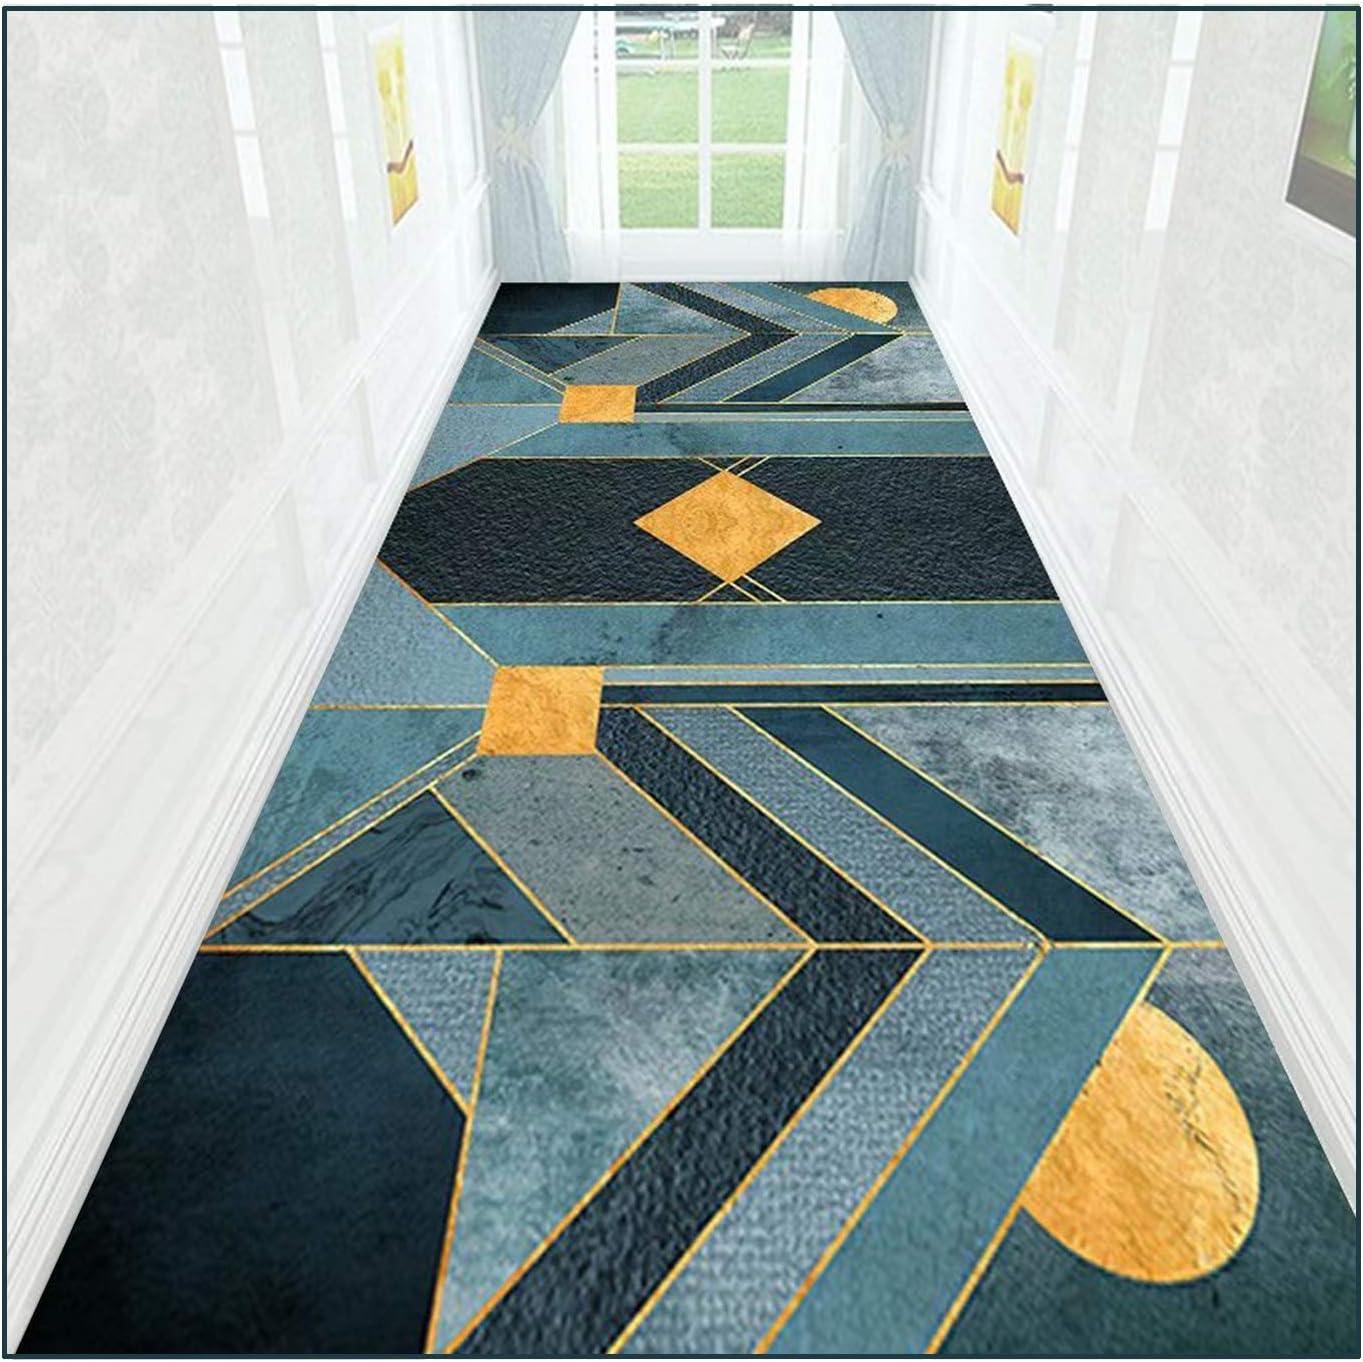 ZEMIN Hallway Runner Rugs Geometry Financial sales Latest item sale Non Patterns Runners Carpet